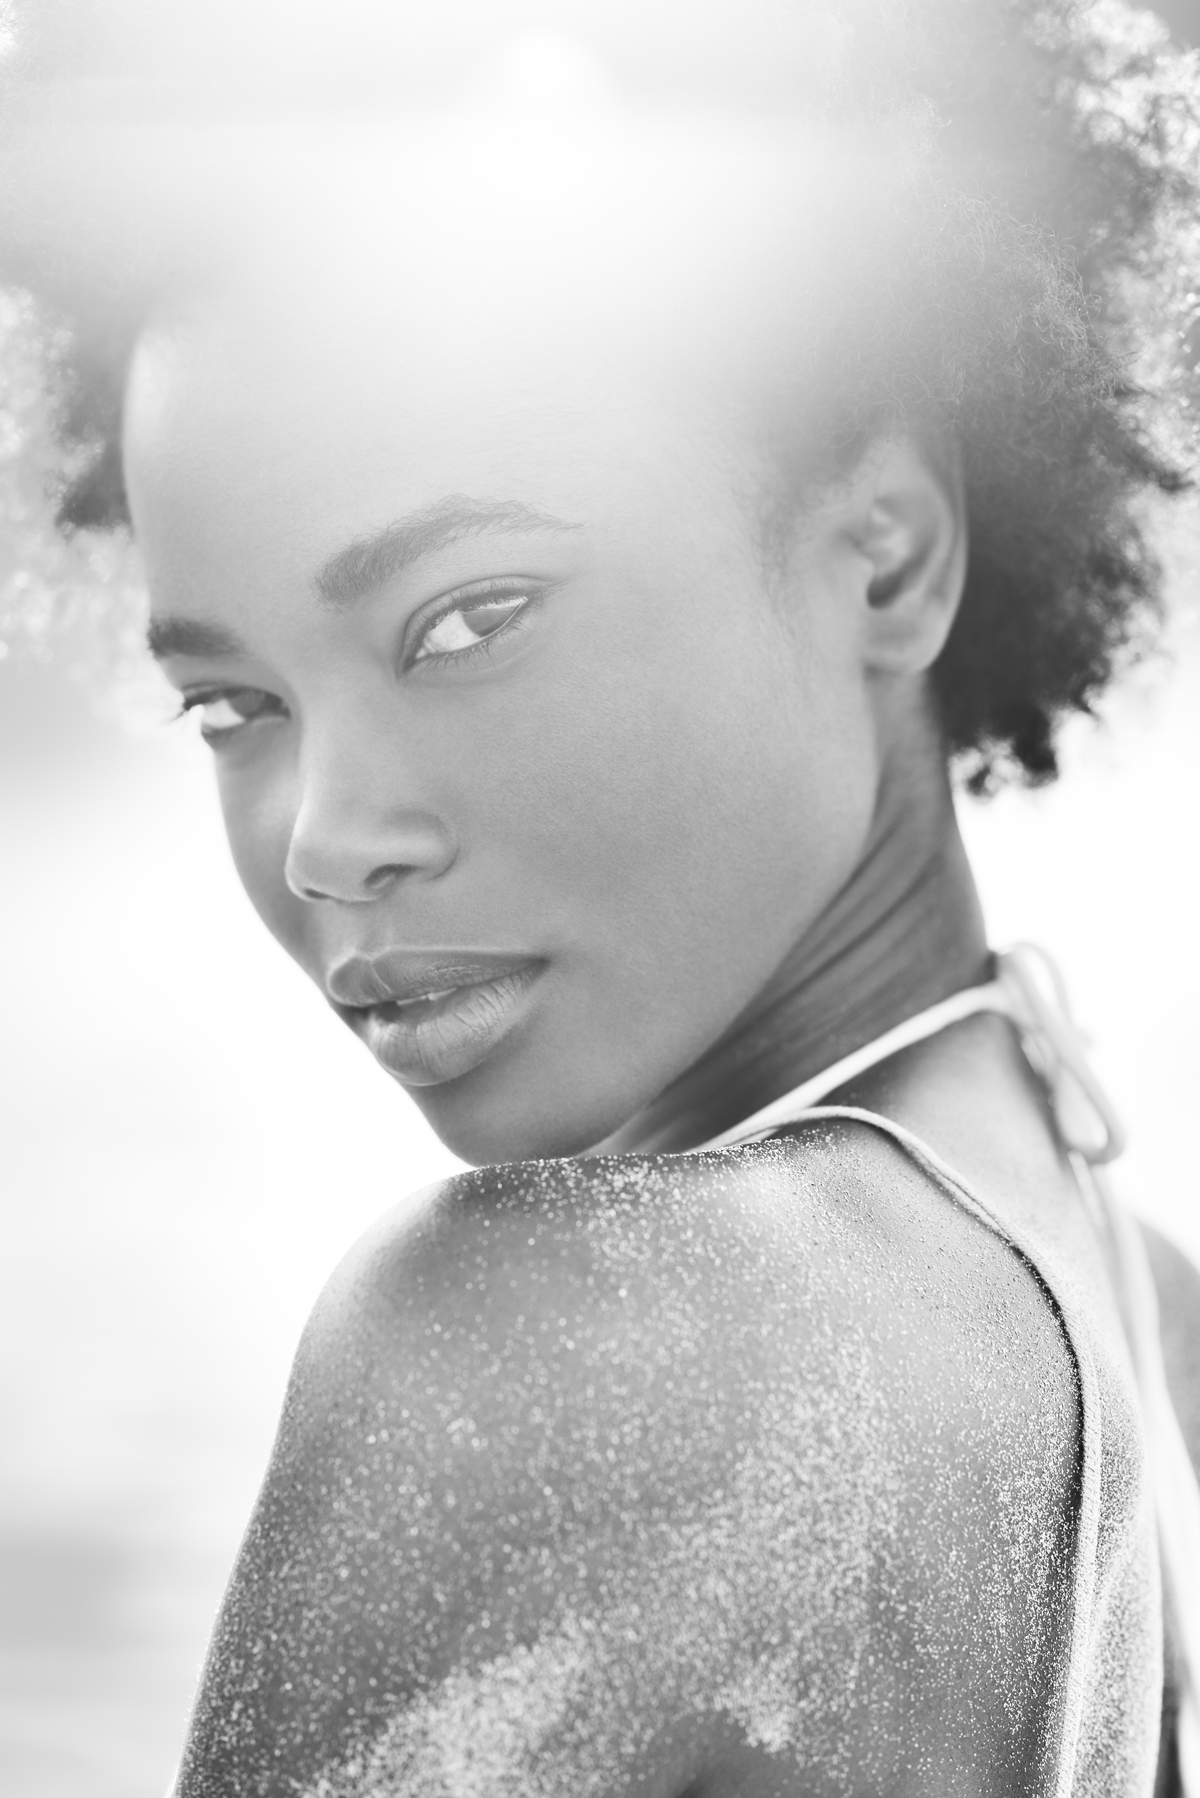 Environ Skin Care | Protect your skin from free radical skin damage - Stop Collagen Damage